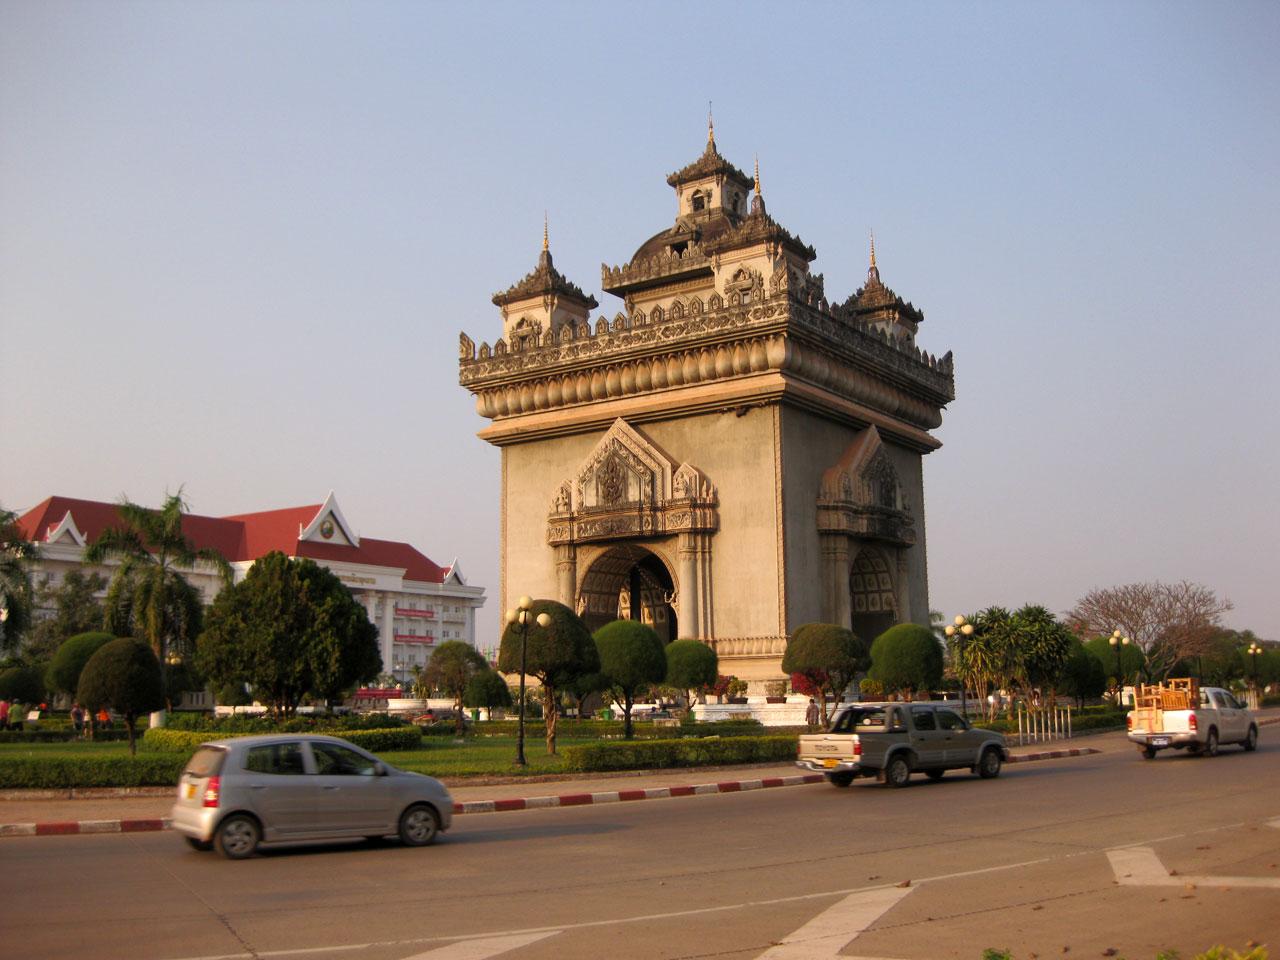 Patuxai victory monument, Vientiane, Laos